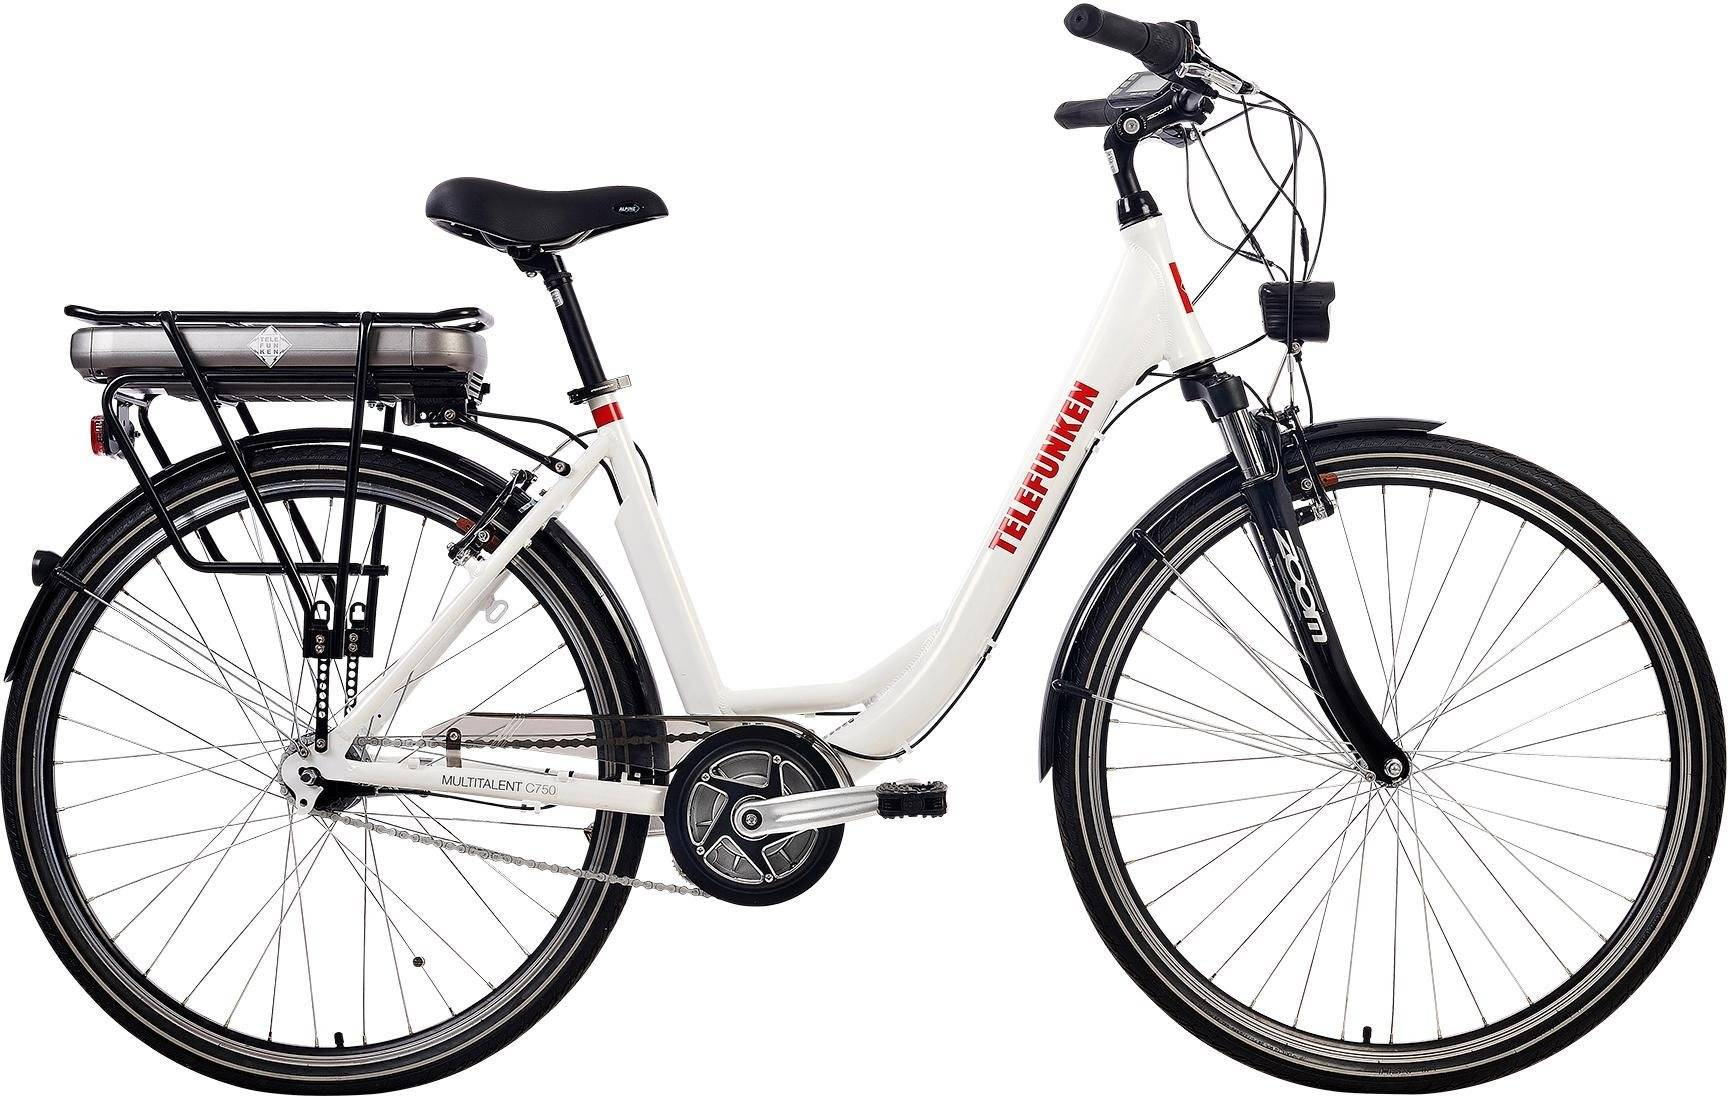 Telefunken E-Bike »Multitalent C750«, Nabenschaltung, weiß